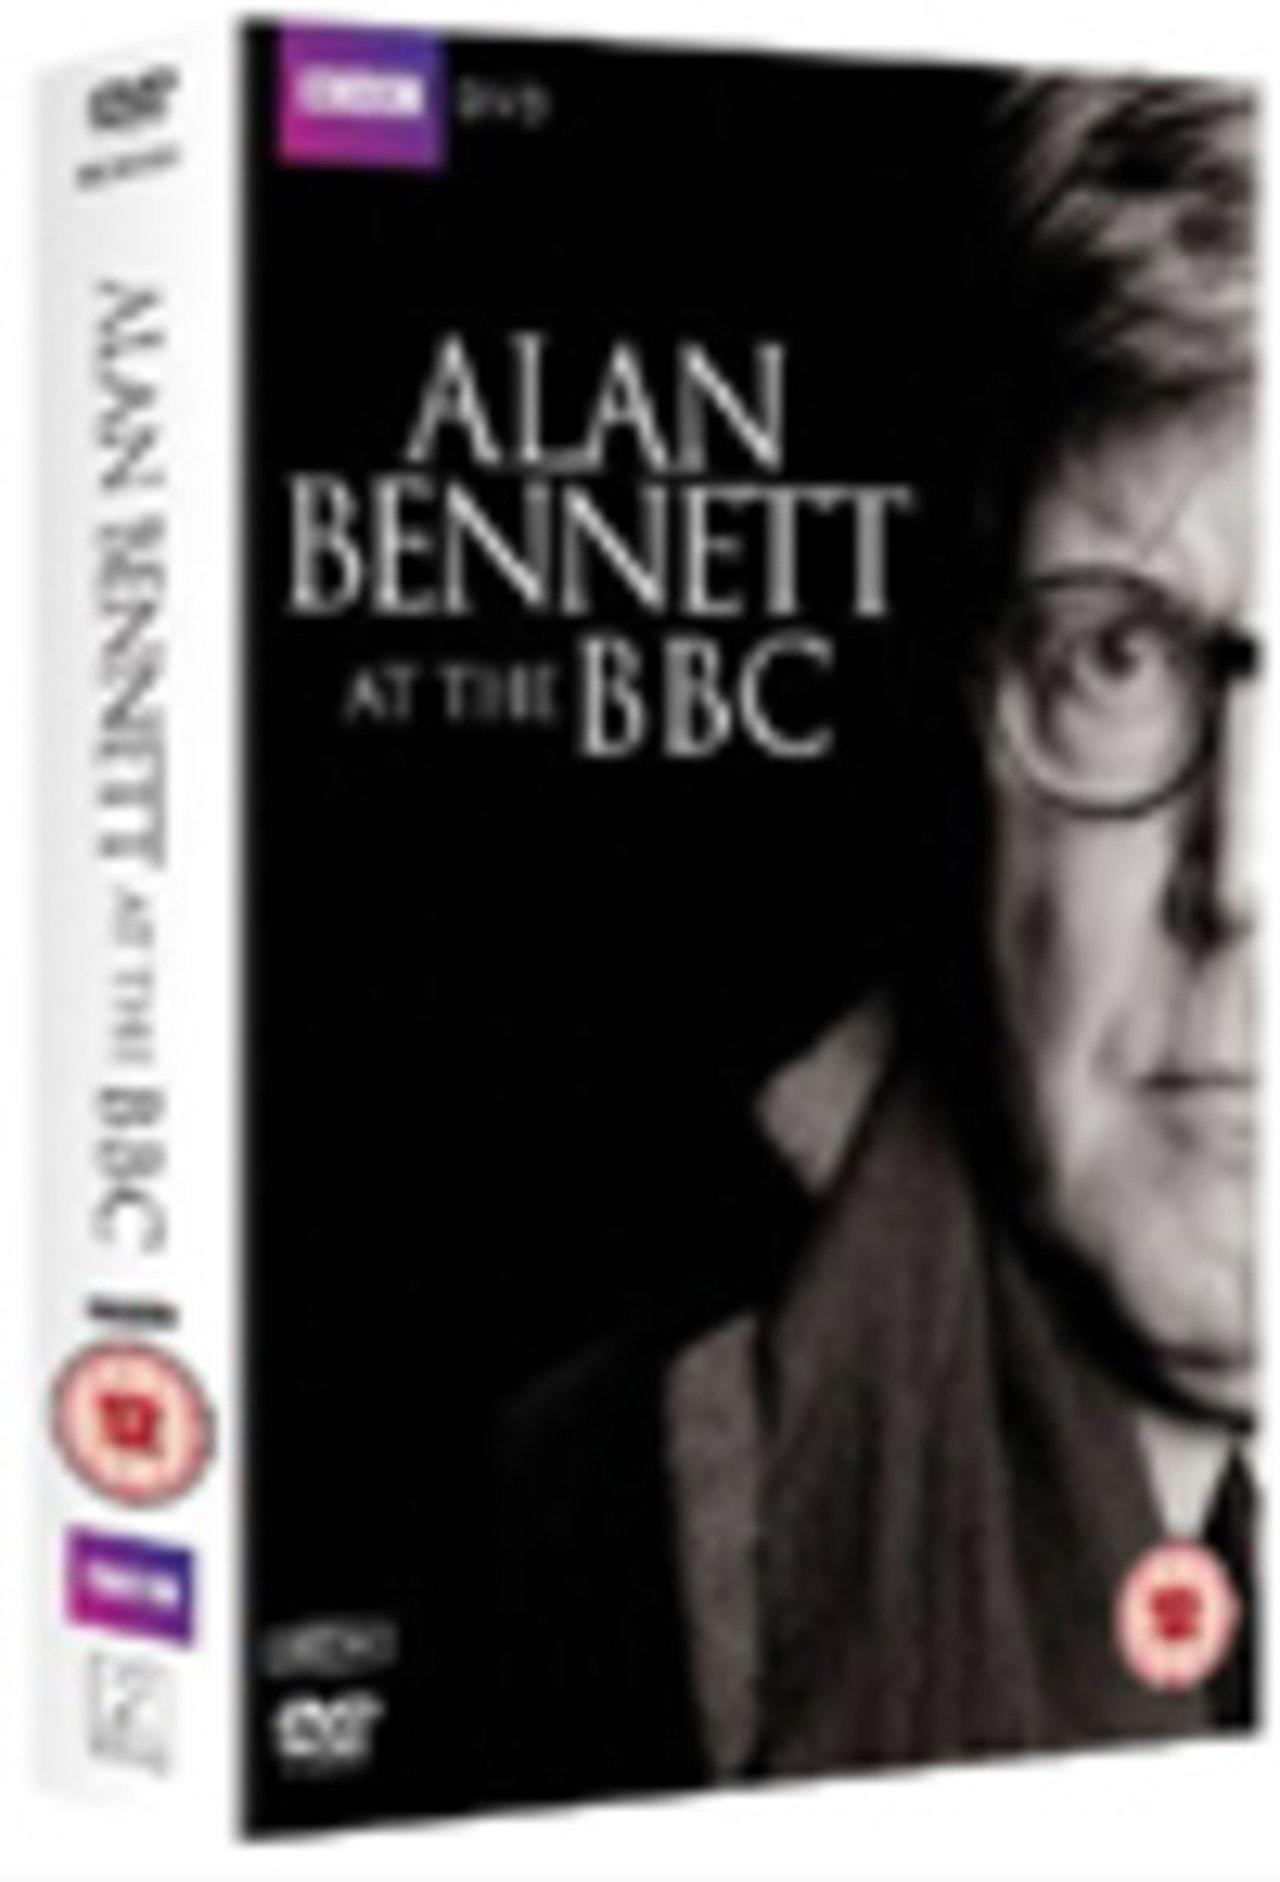 Alan Bennett: At the BBC - 1